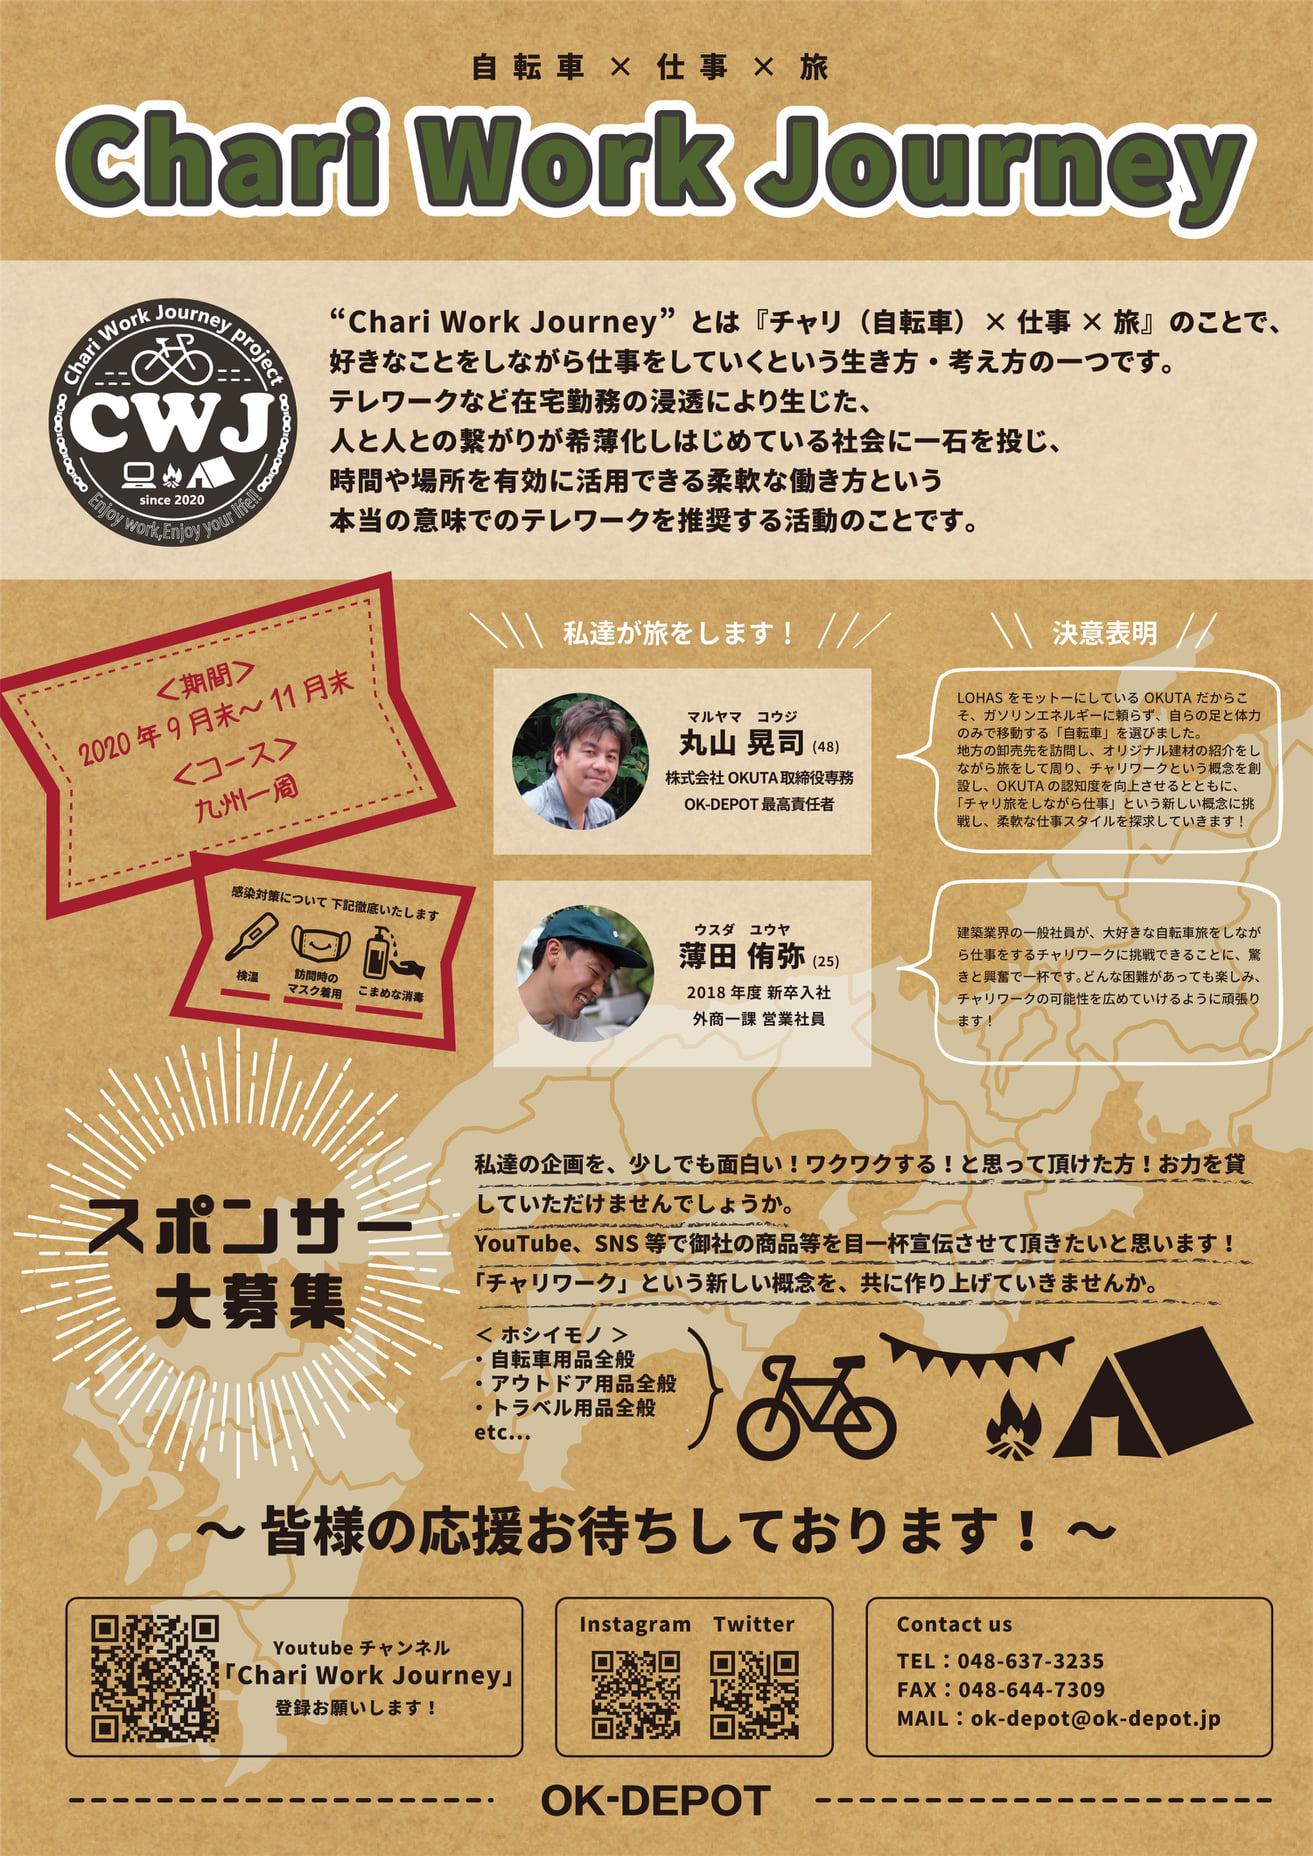 Chari Work Journey出発式4